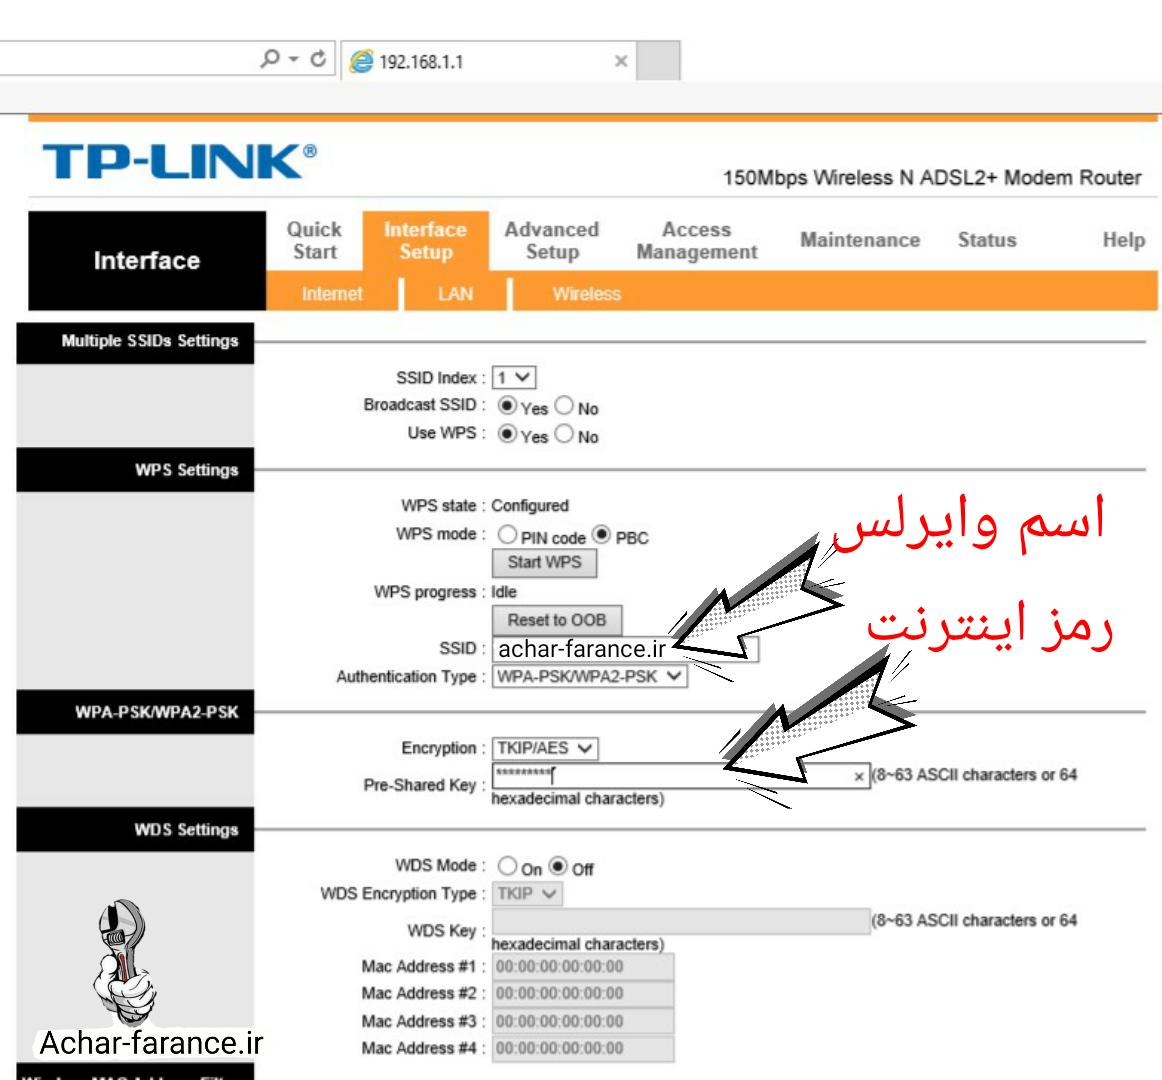 79sj_sketch-1467023788496.png